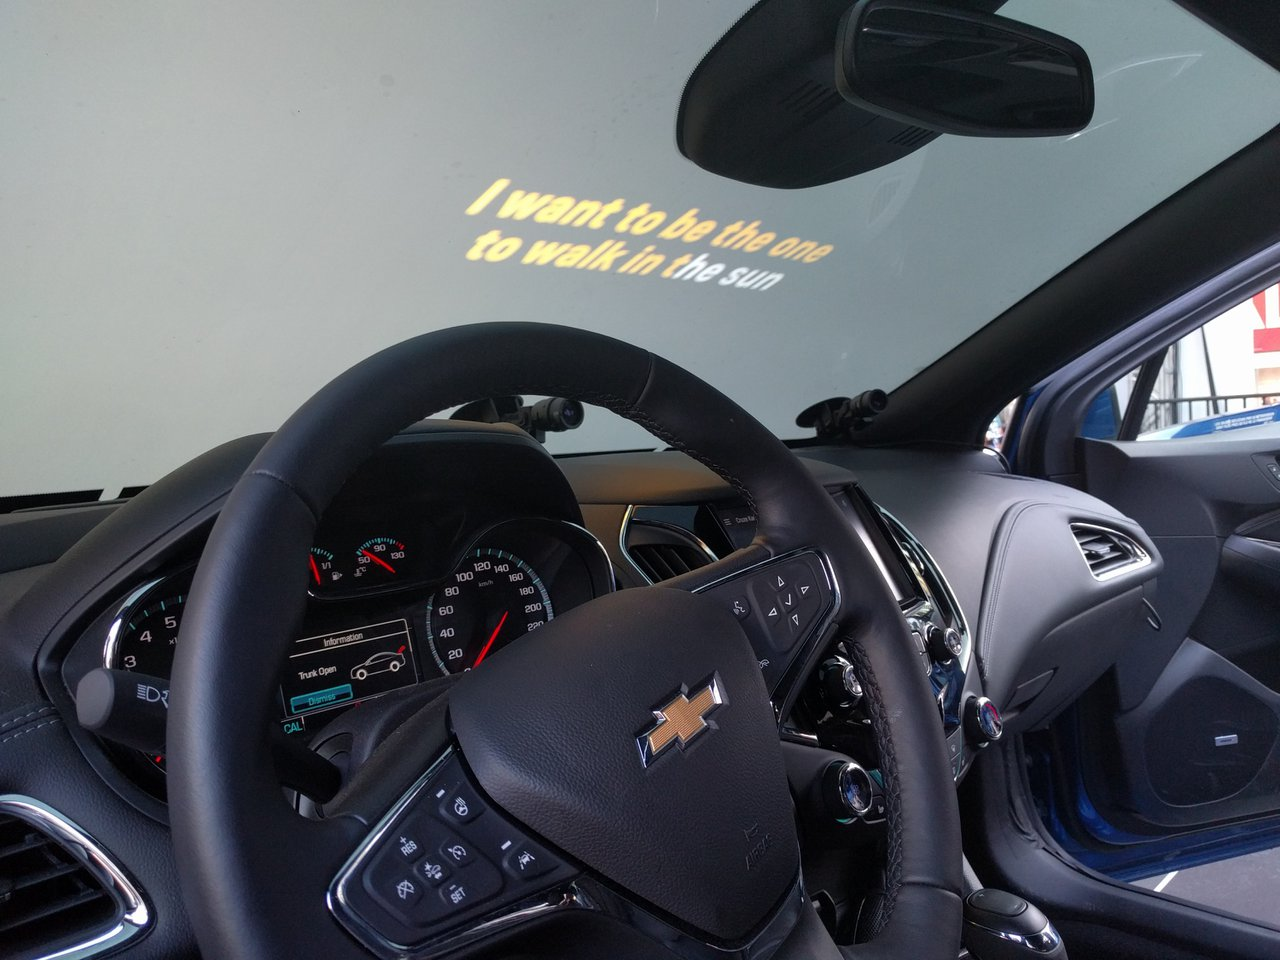 Chevy Cruze Carpool Karaoke photo IMG_20160629_194422.jpg